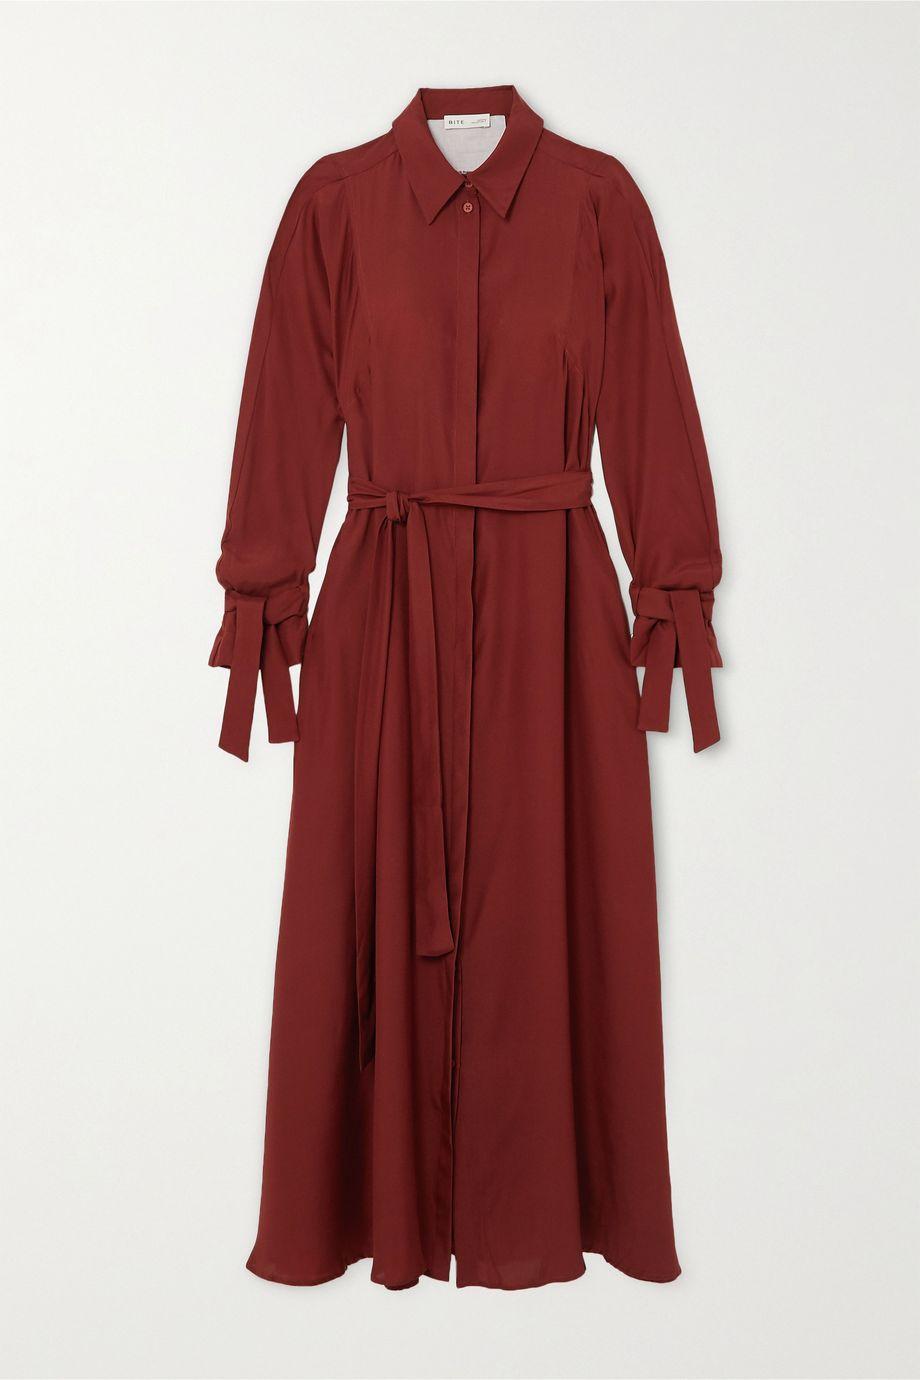 BITE Studios + NET SUSTAIN belted organic silk maxi dress